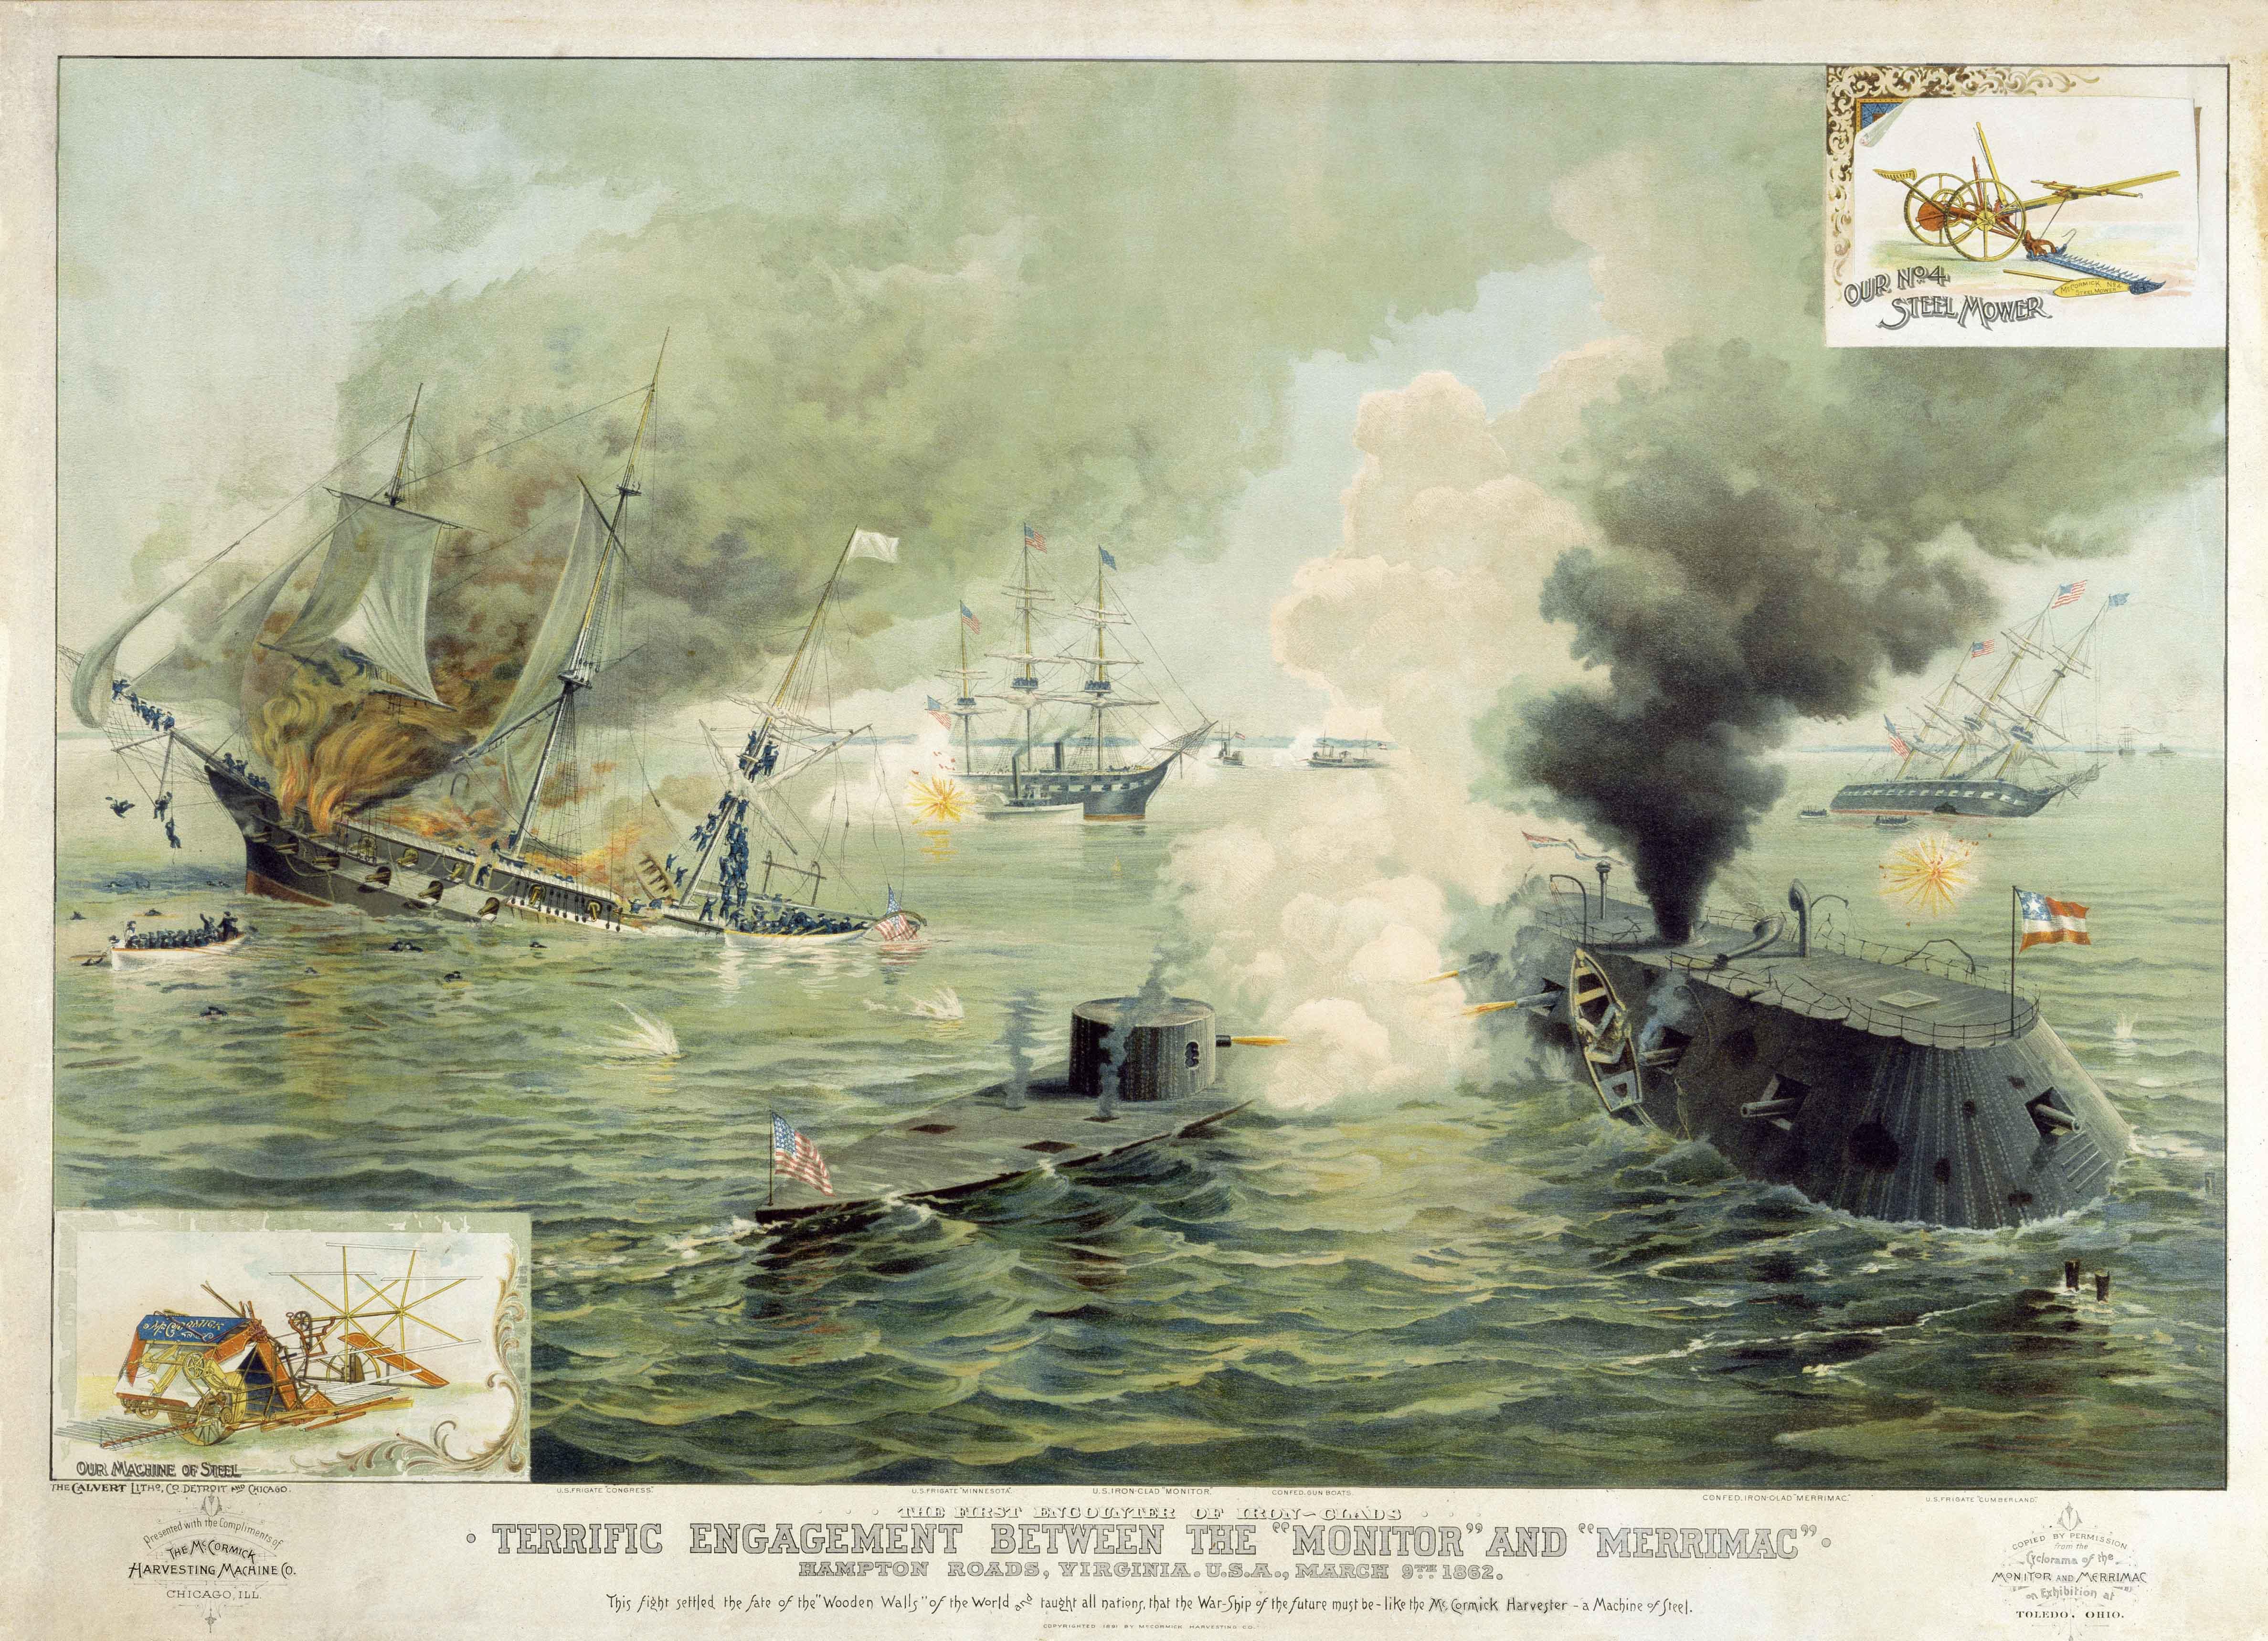 Historic image of the Battle of Hampton Roads.